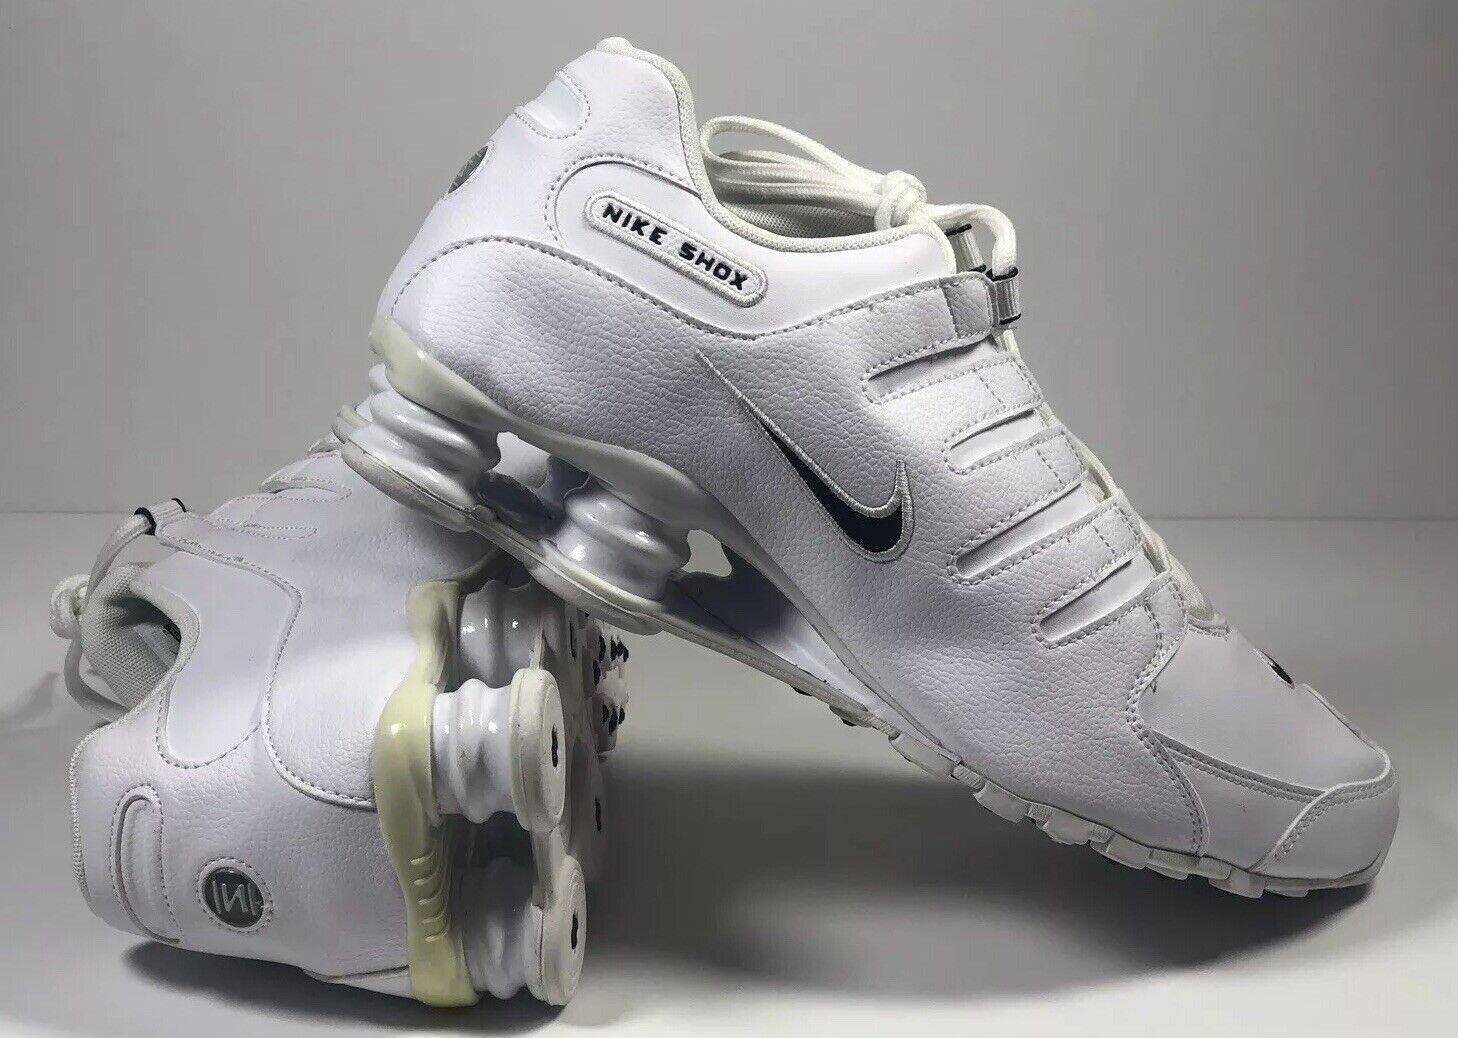 New Nike Shox NZ Classic White Running shoes Men SZ 10 NWOB